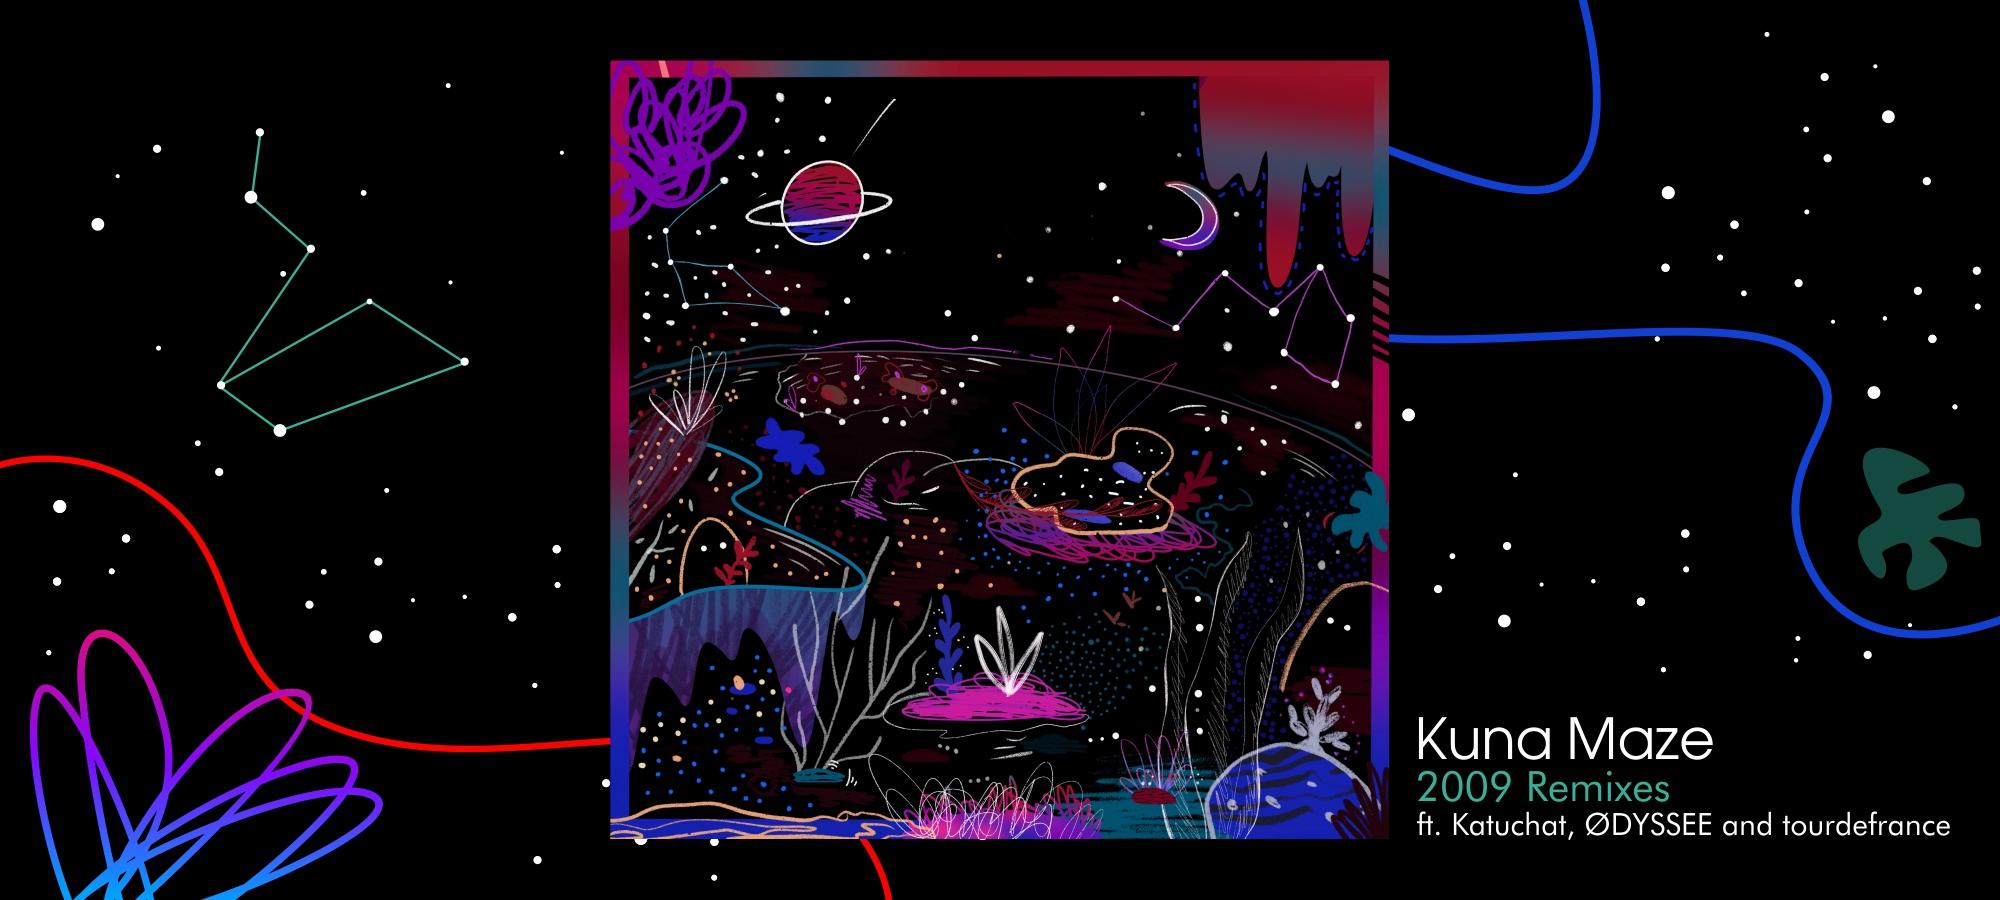 Kuna Maze - 2009 REMIXES